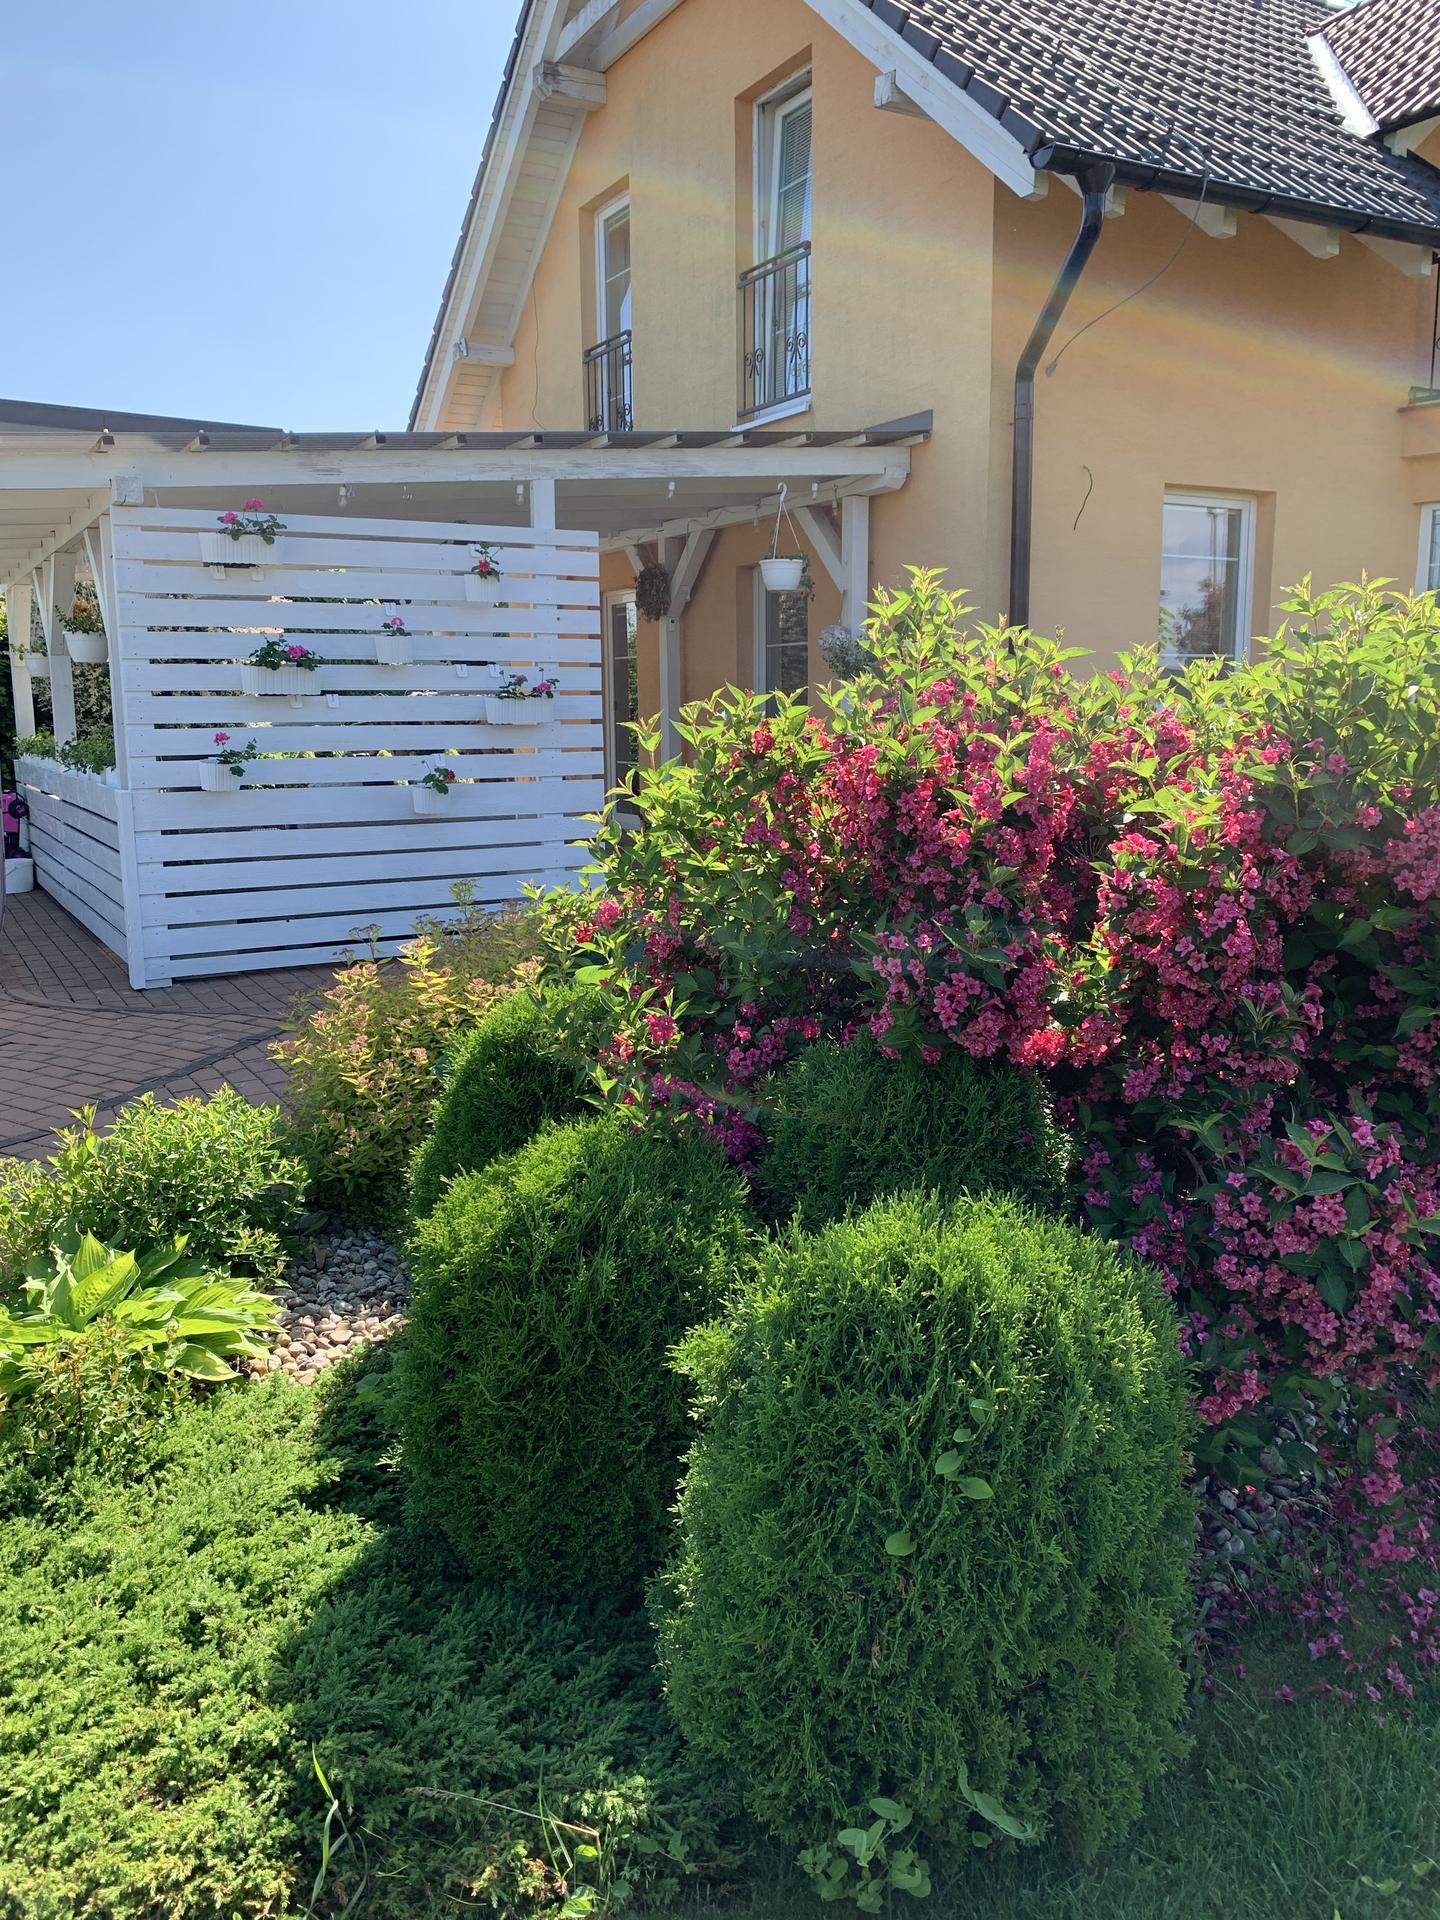 Naše barevná zahrada 🌸 - Z druhé strany visí muškáty 🤗